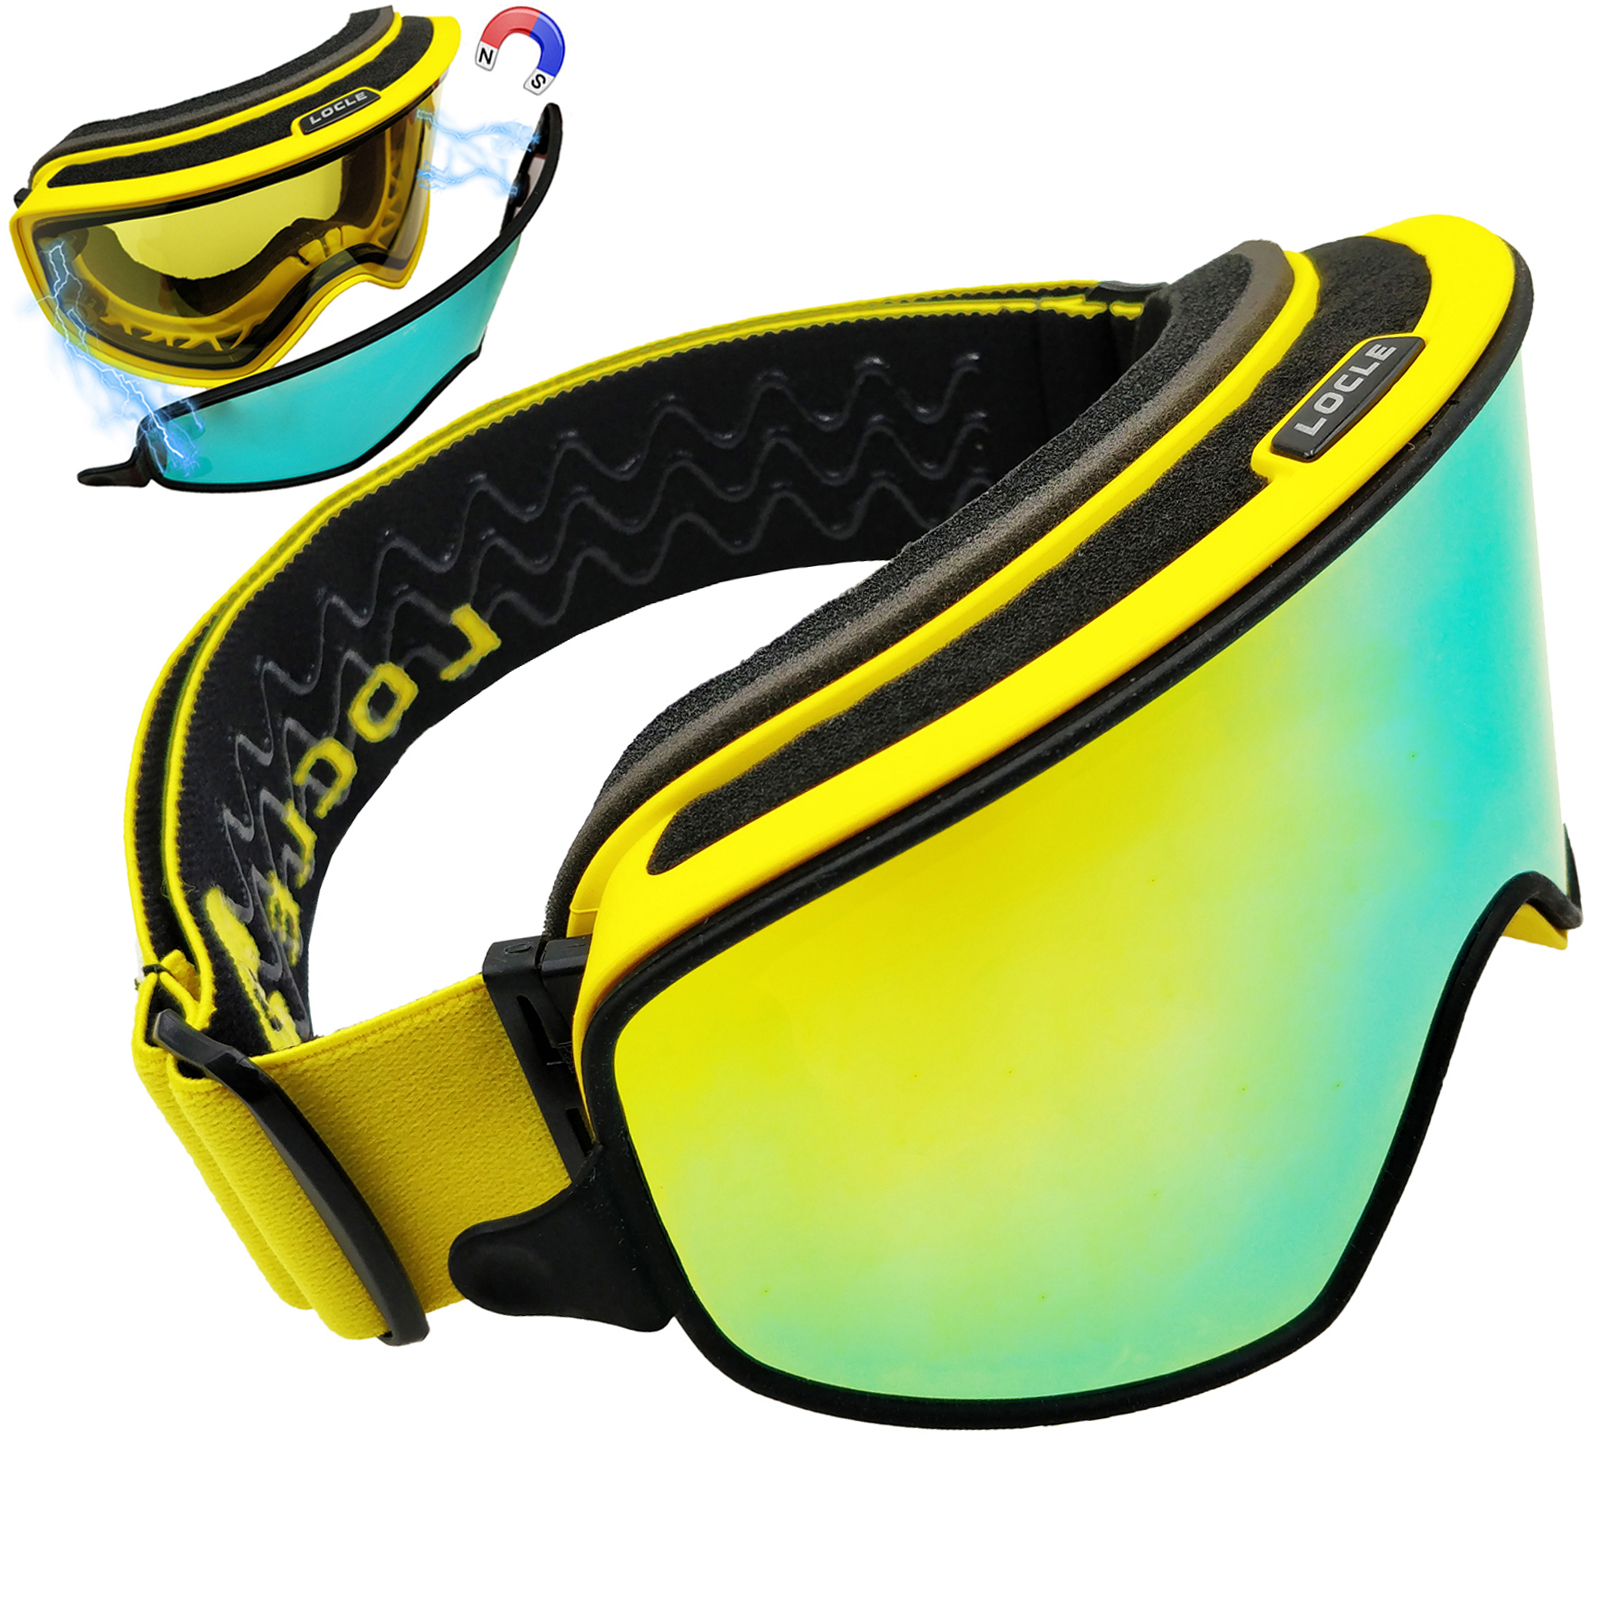 LOCLE Ski Goggles 2 IN 1 With Magnetic Dual-use For Night Ski Eyewear Anti-fog UV400 Ski Snowboard Goggles Men Women Ski Glasses